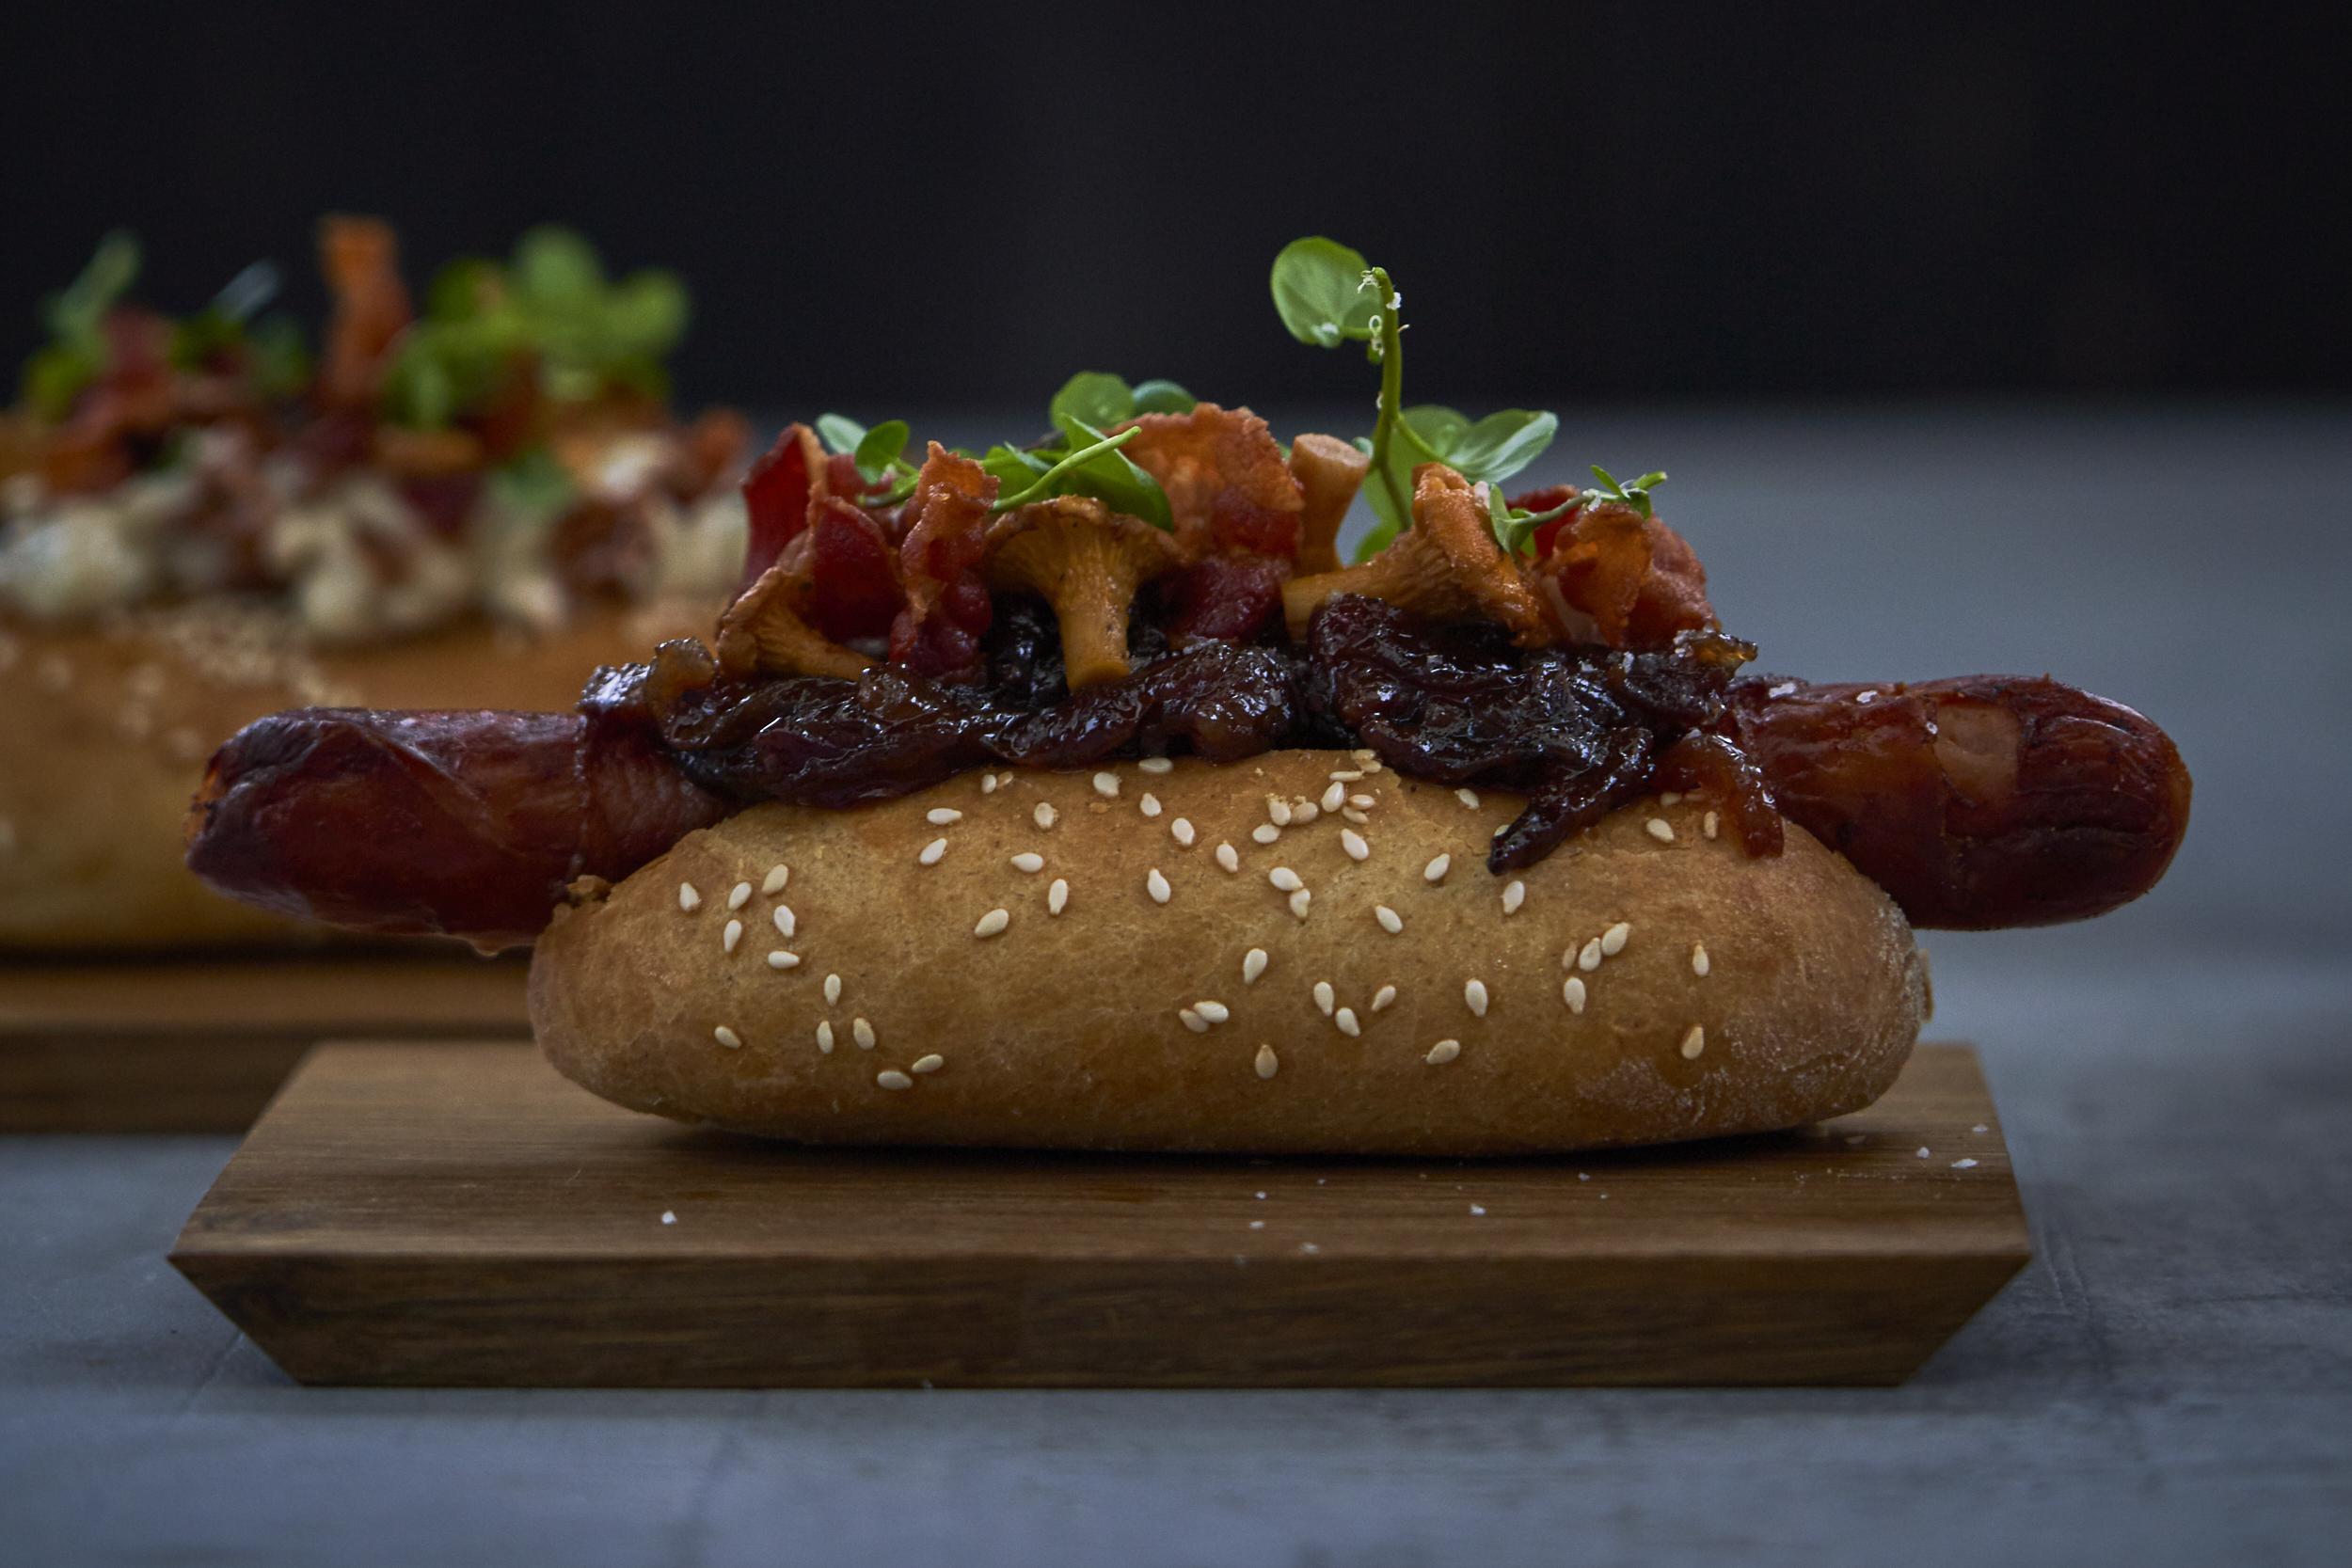 Årets baconret: Baconhotdoggen!